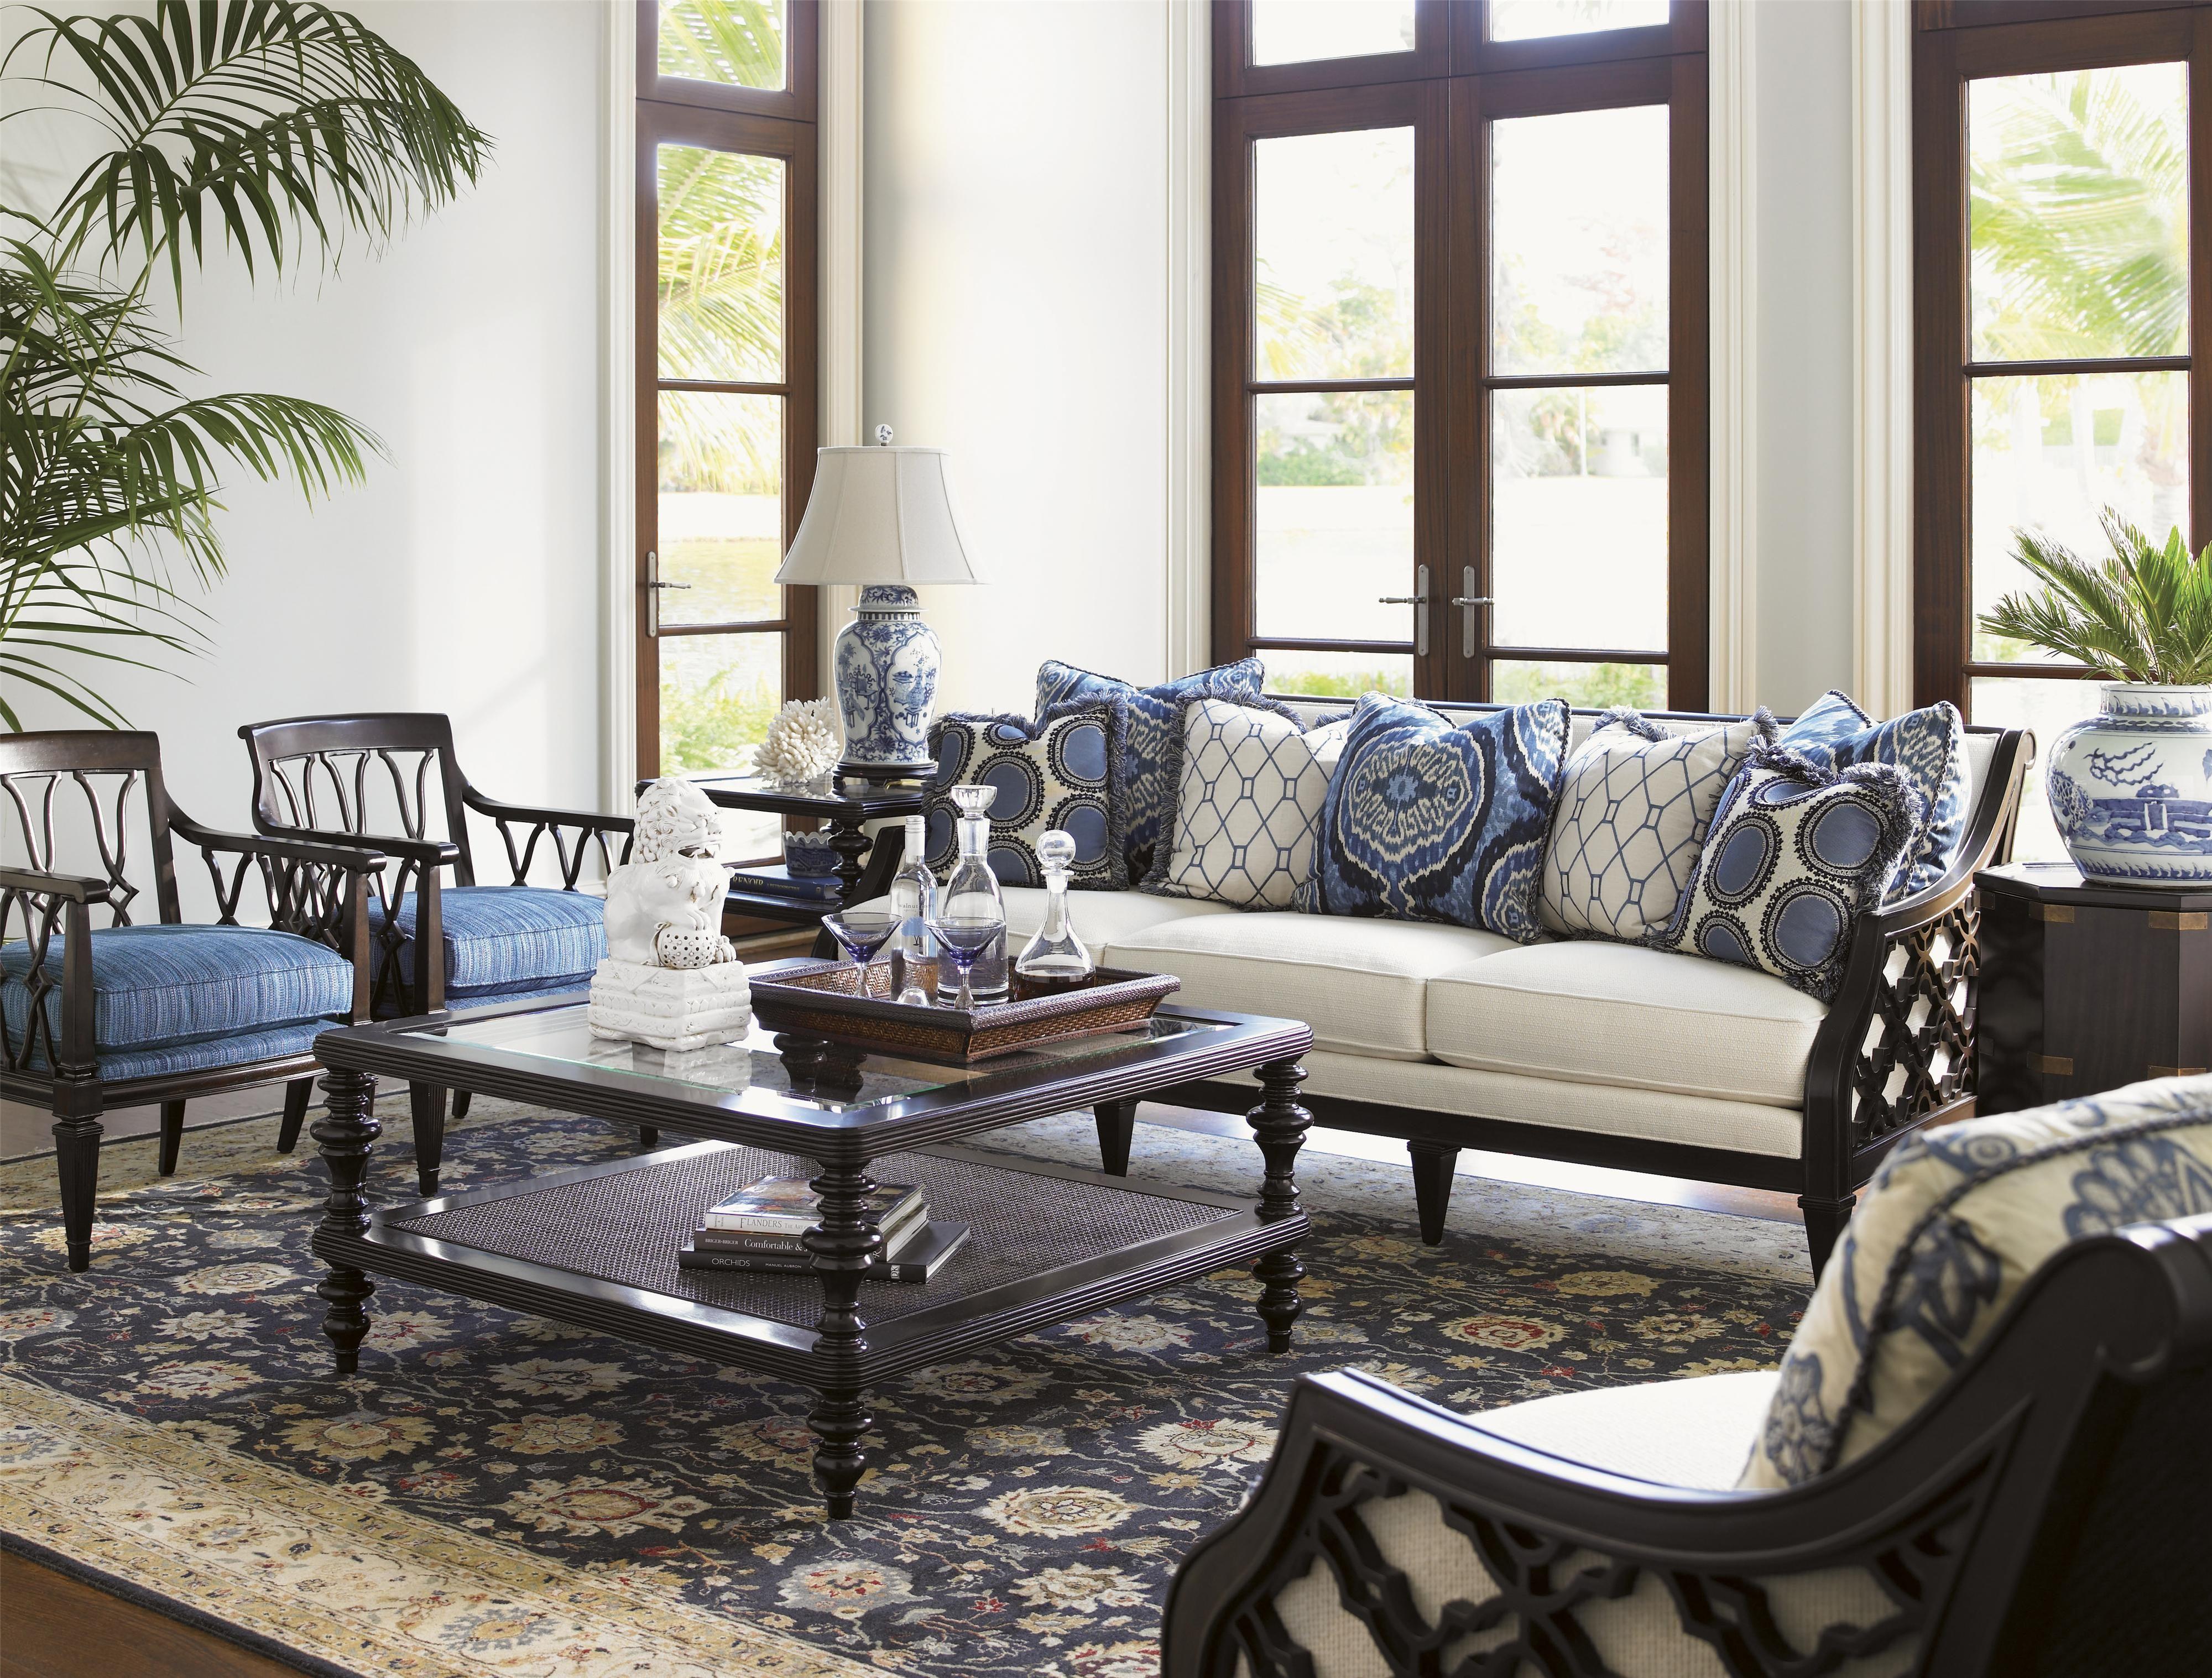 Home interior design royal royal kahala bay club exposed wood sofa with quatrefoil design by